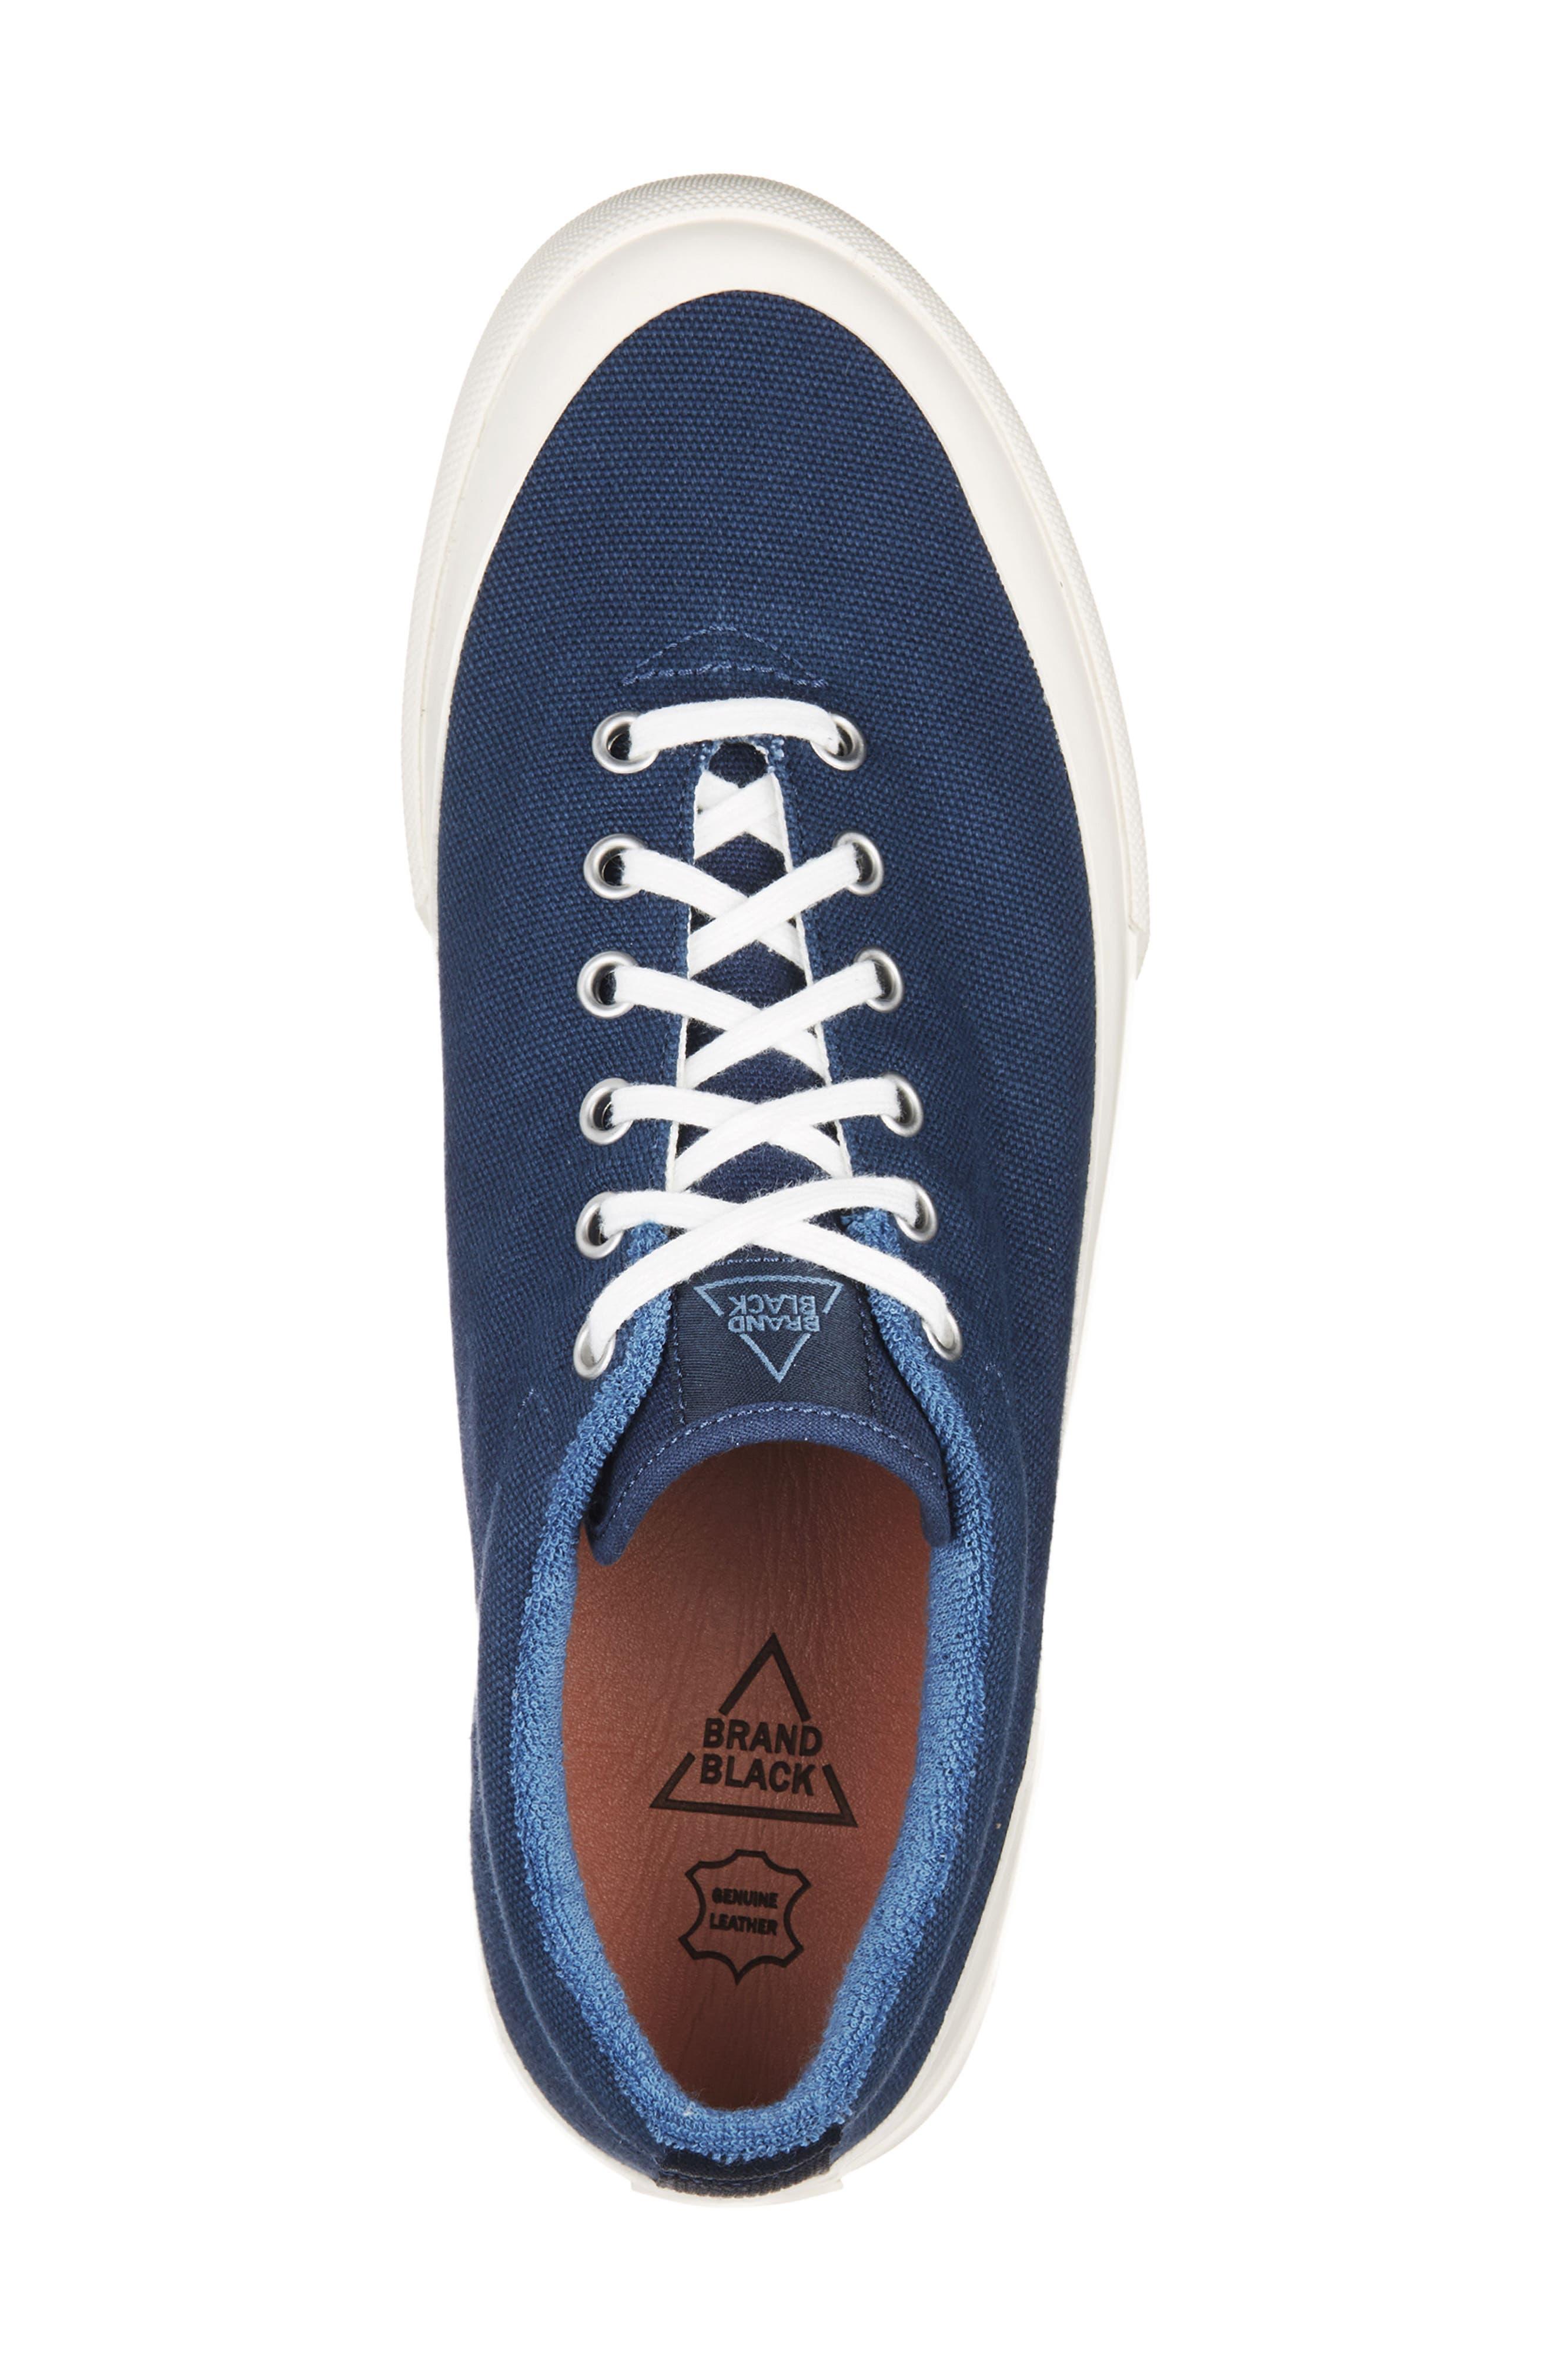 Vesta Low Top Sneaker,                             Alternate thumbnail 5, color,                             Navy